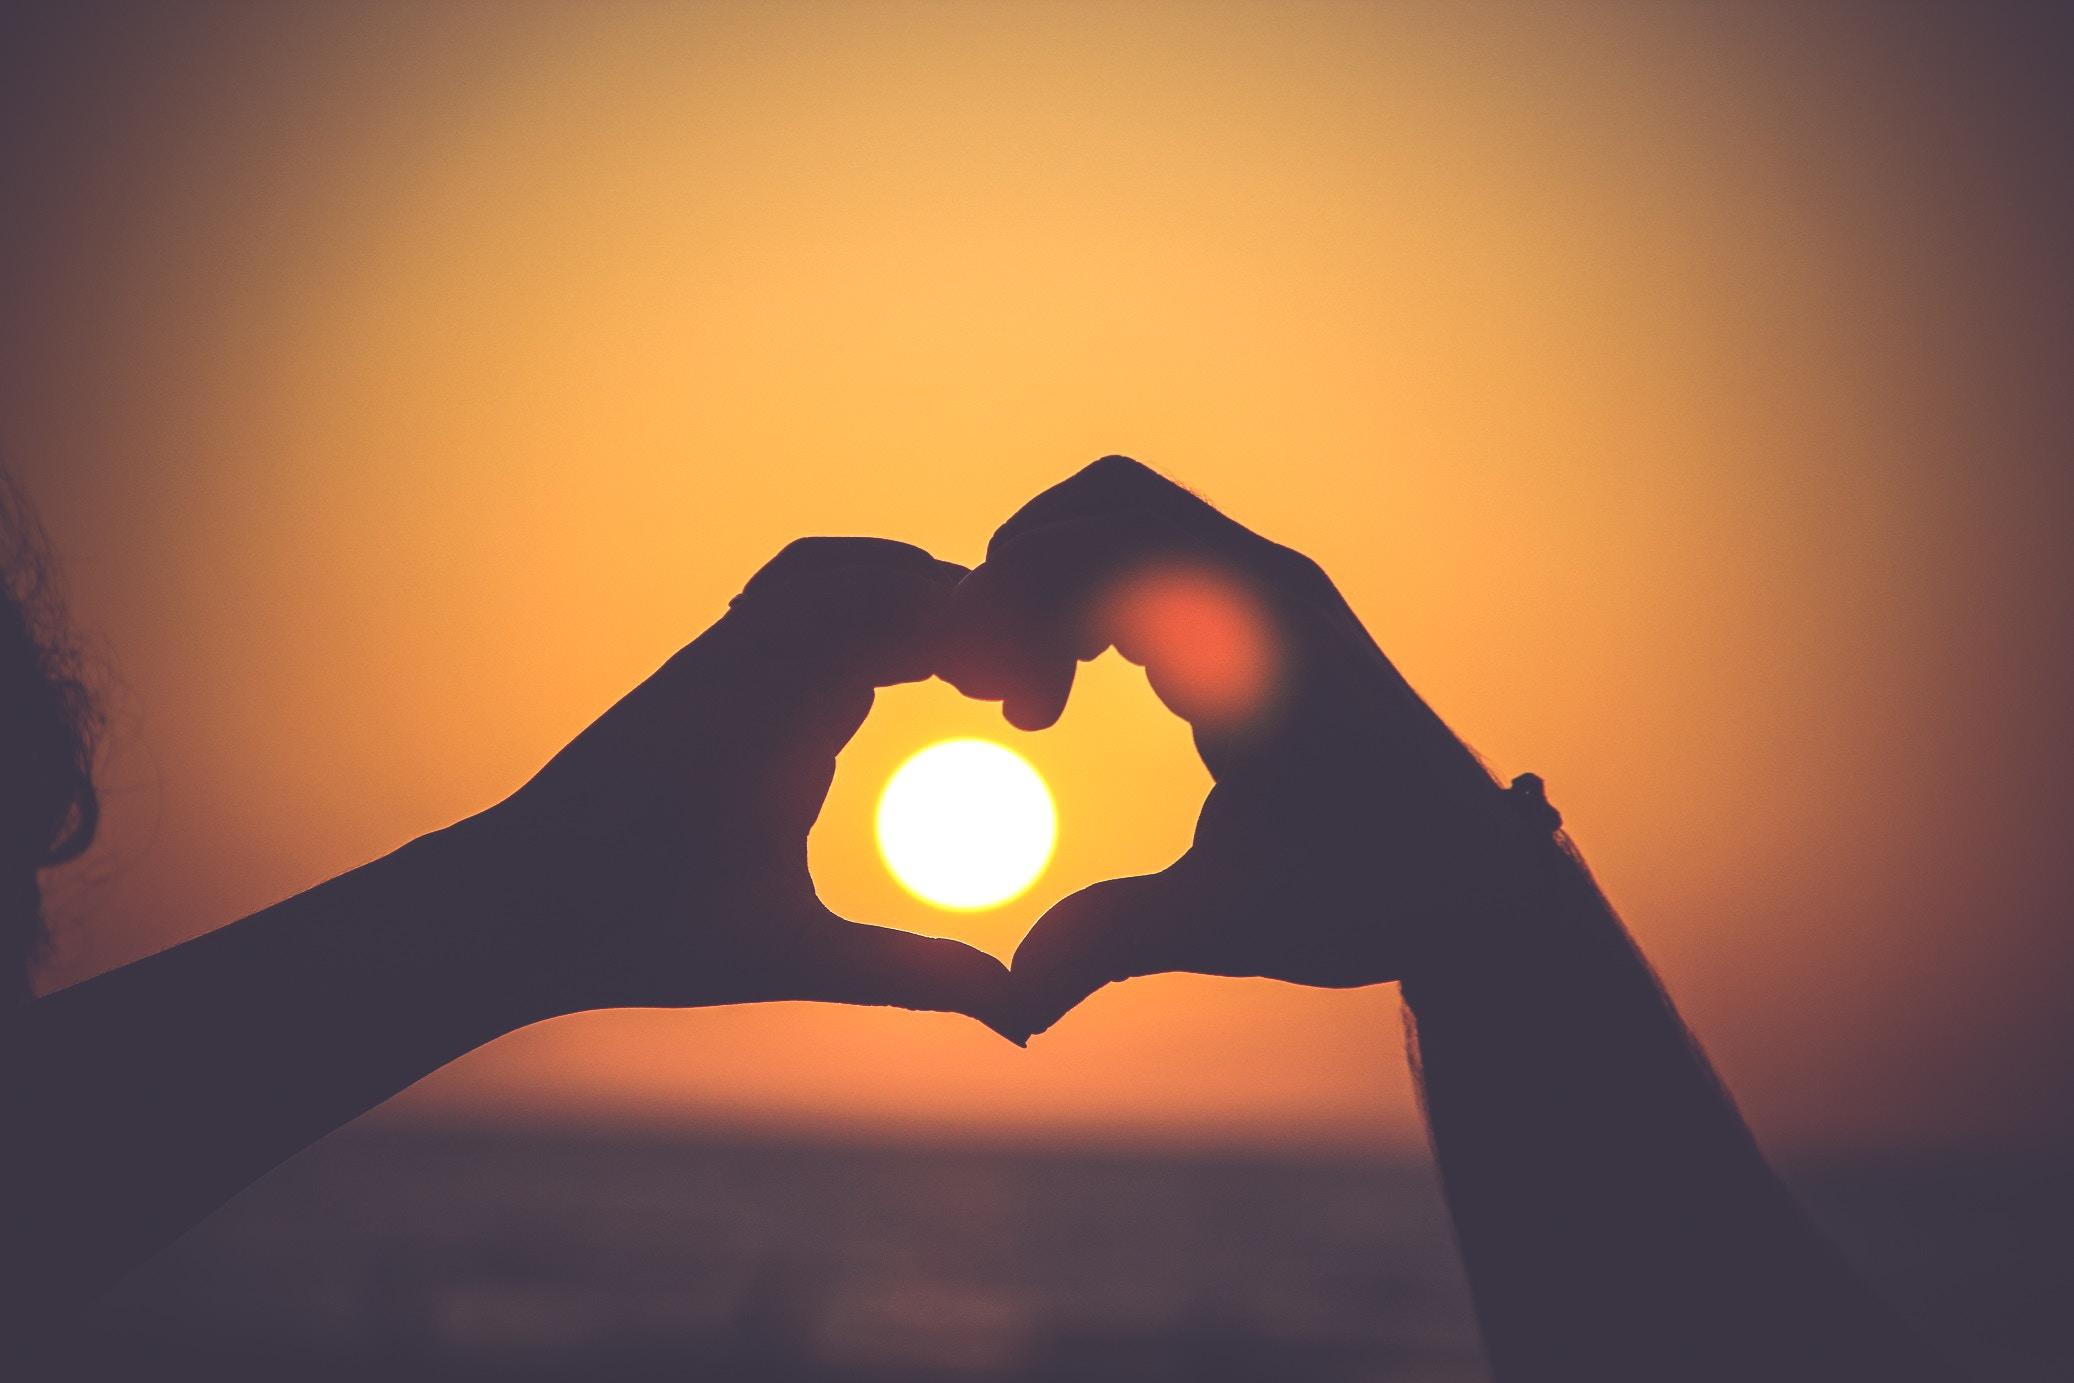 love heart emotional argument business case reuse waste surplus